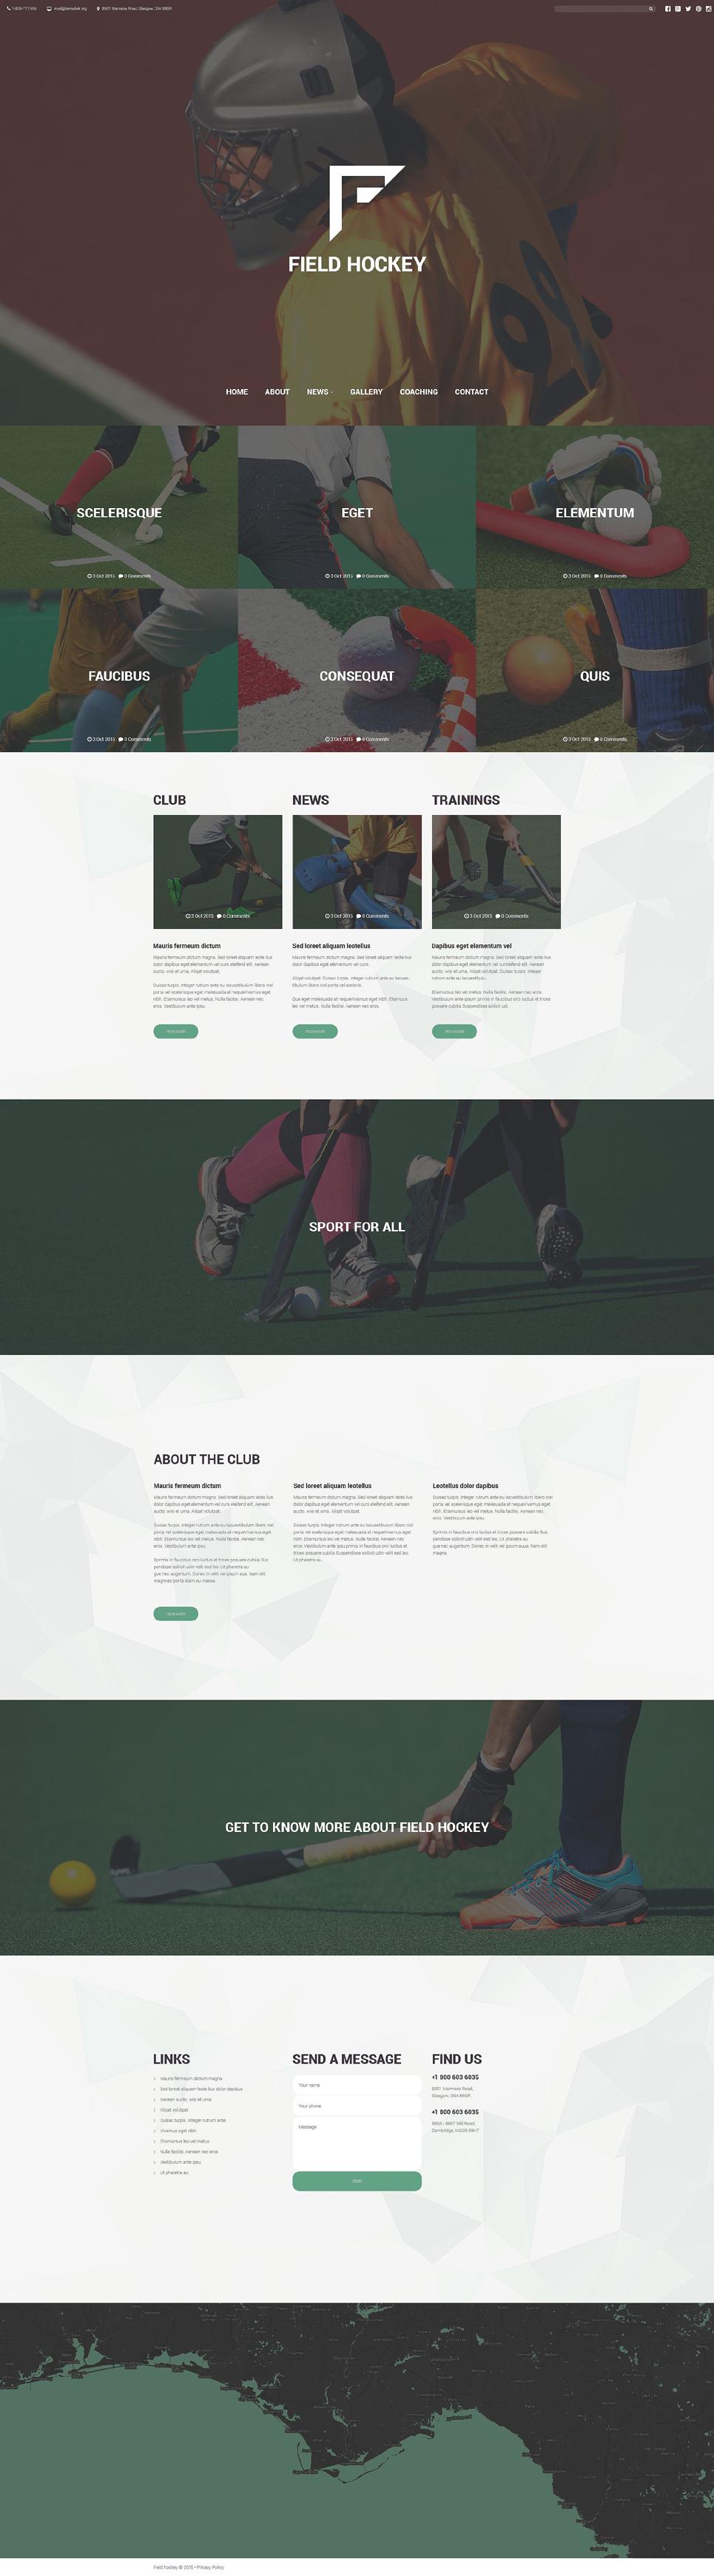 Field Hockey Club template illustration image